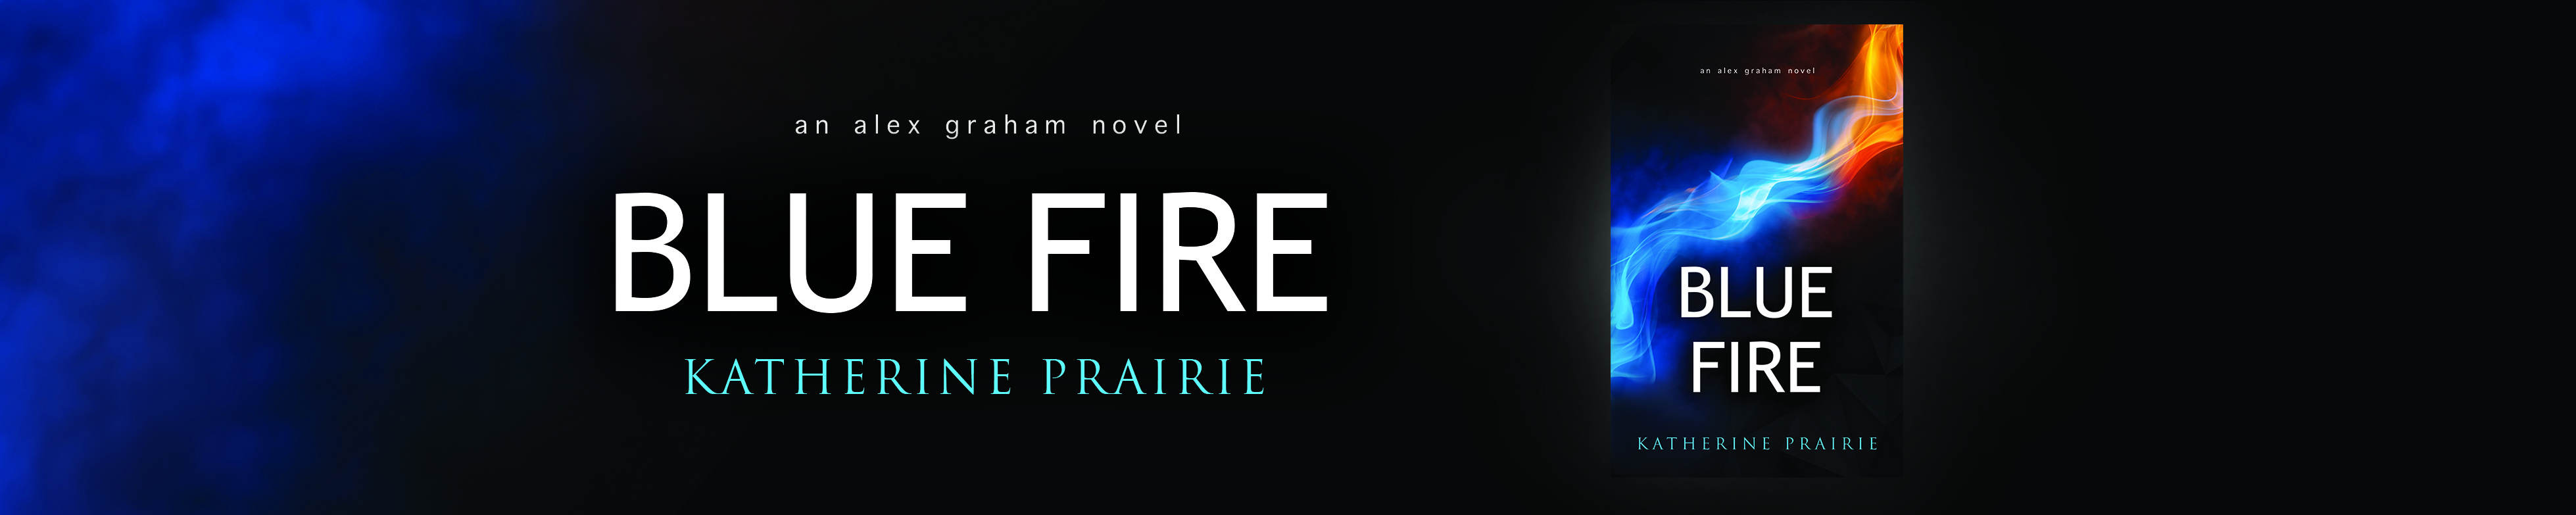 Katherine Prairie